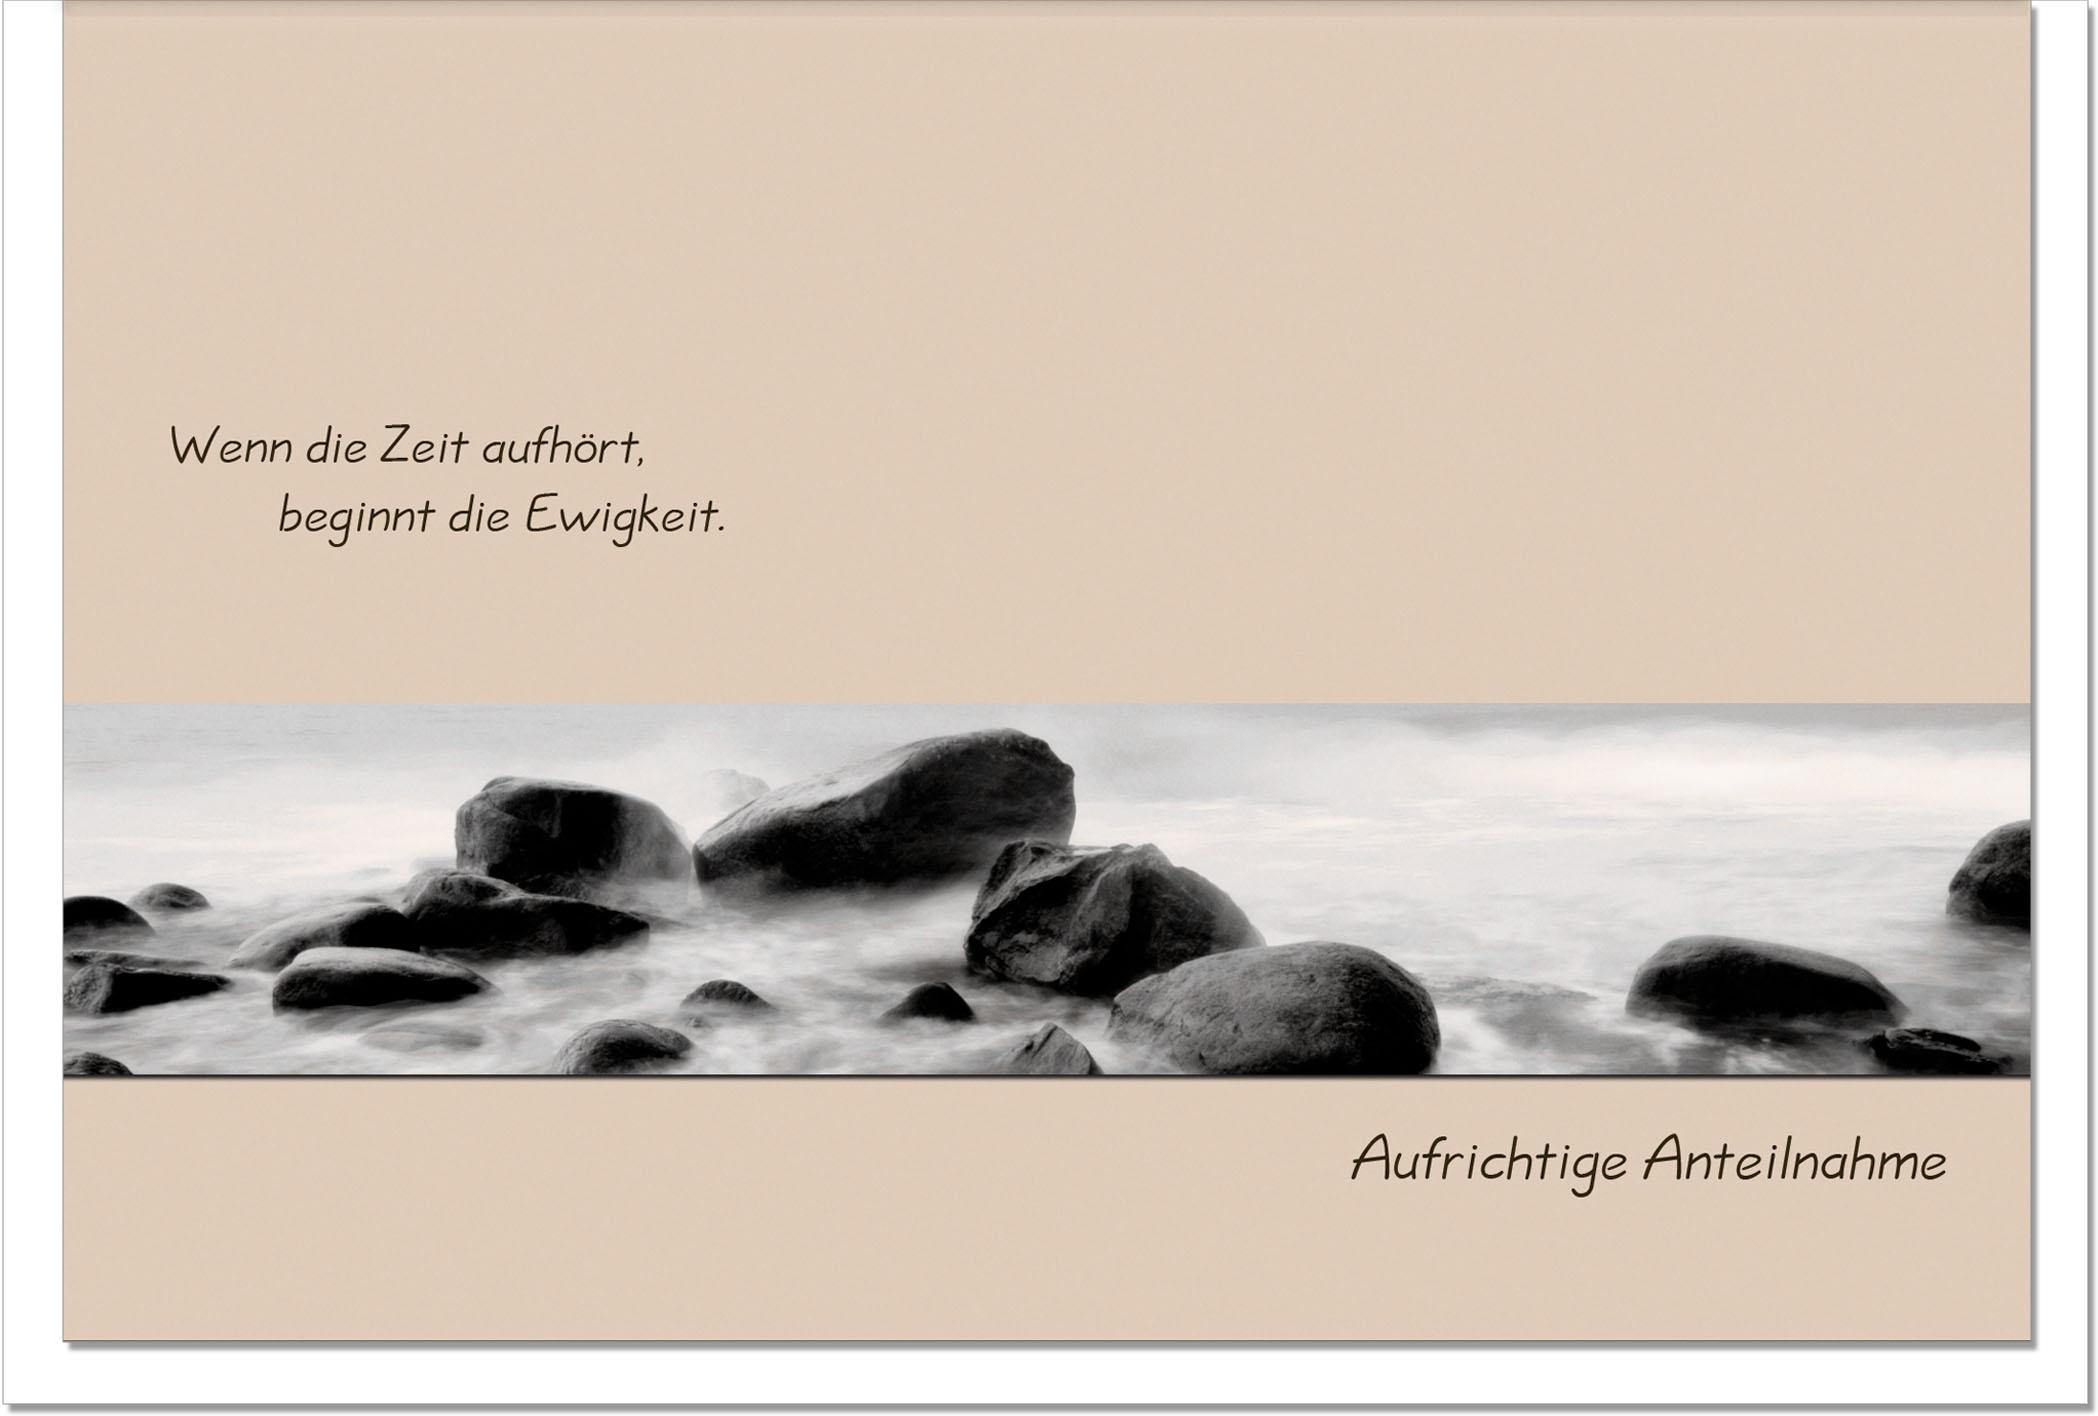 Trauerkarte BEGINN DER EWIGKEIT | Felsen | metALUm #00011